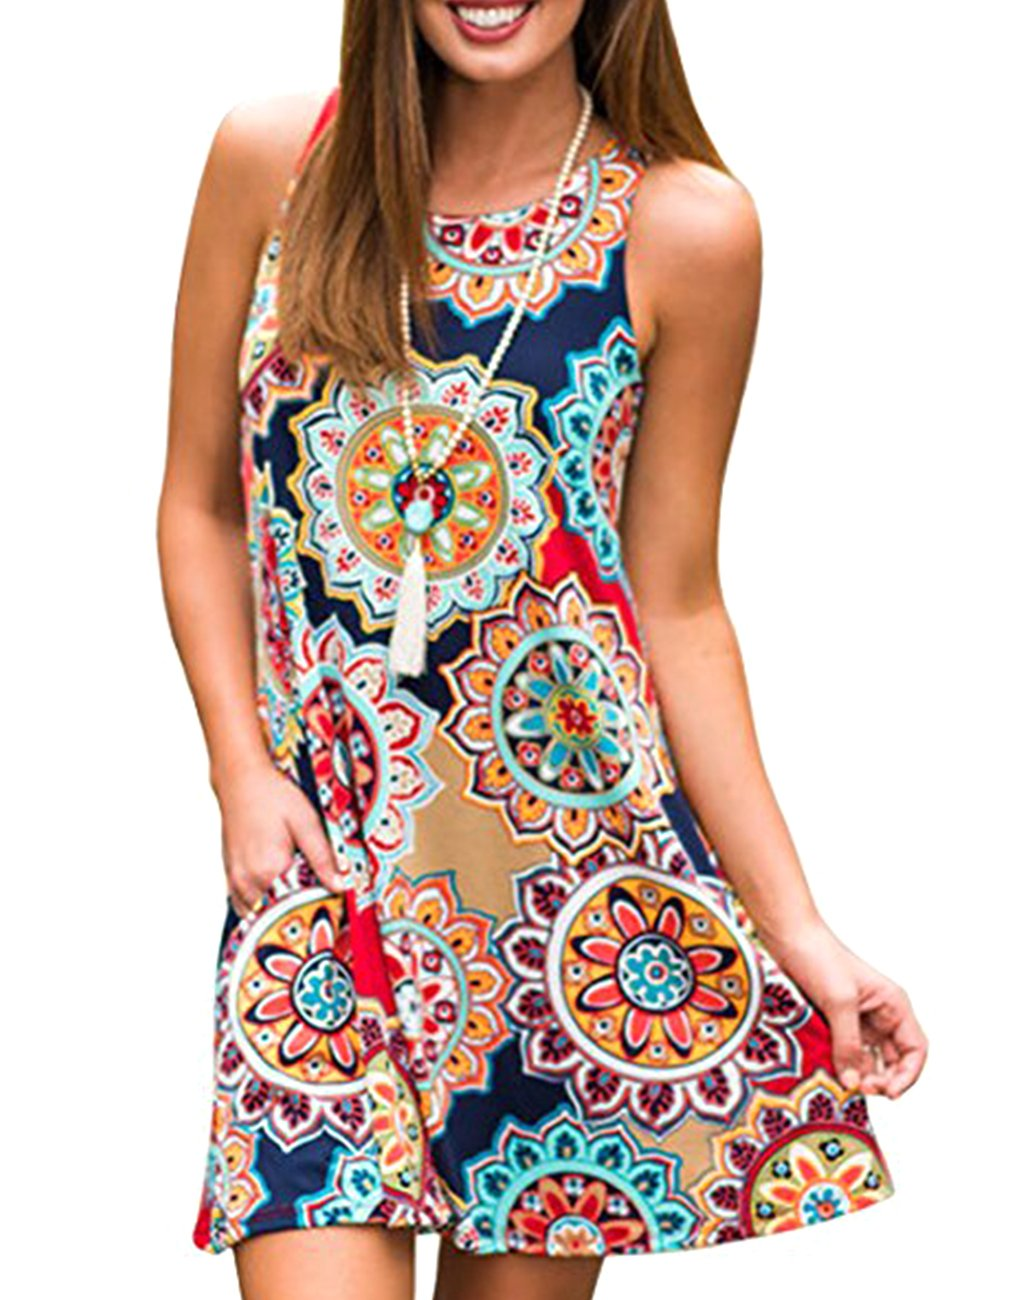 ANDUUNI Womens Summer Short Sleeve Striped Tunic Tops Junior Casual Color Block Tee-Shirt